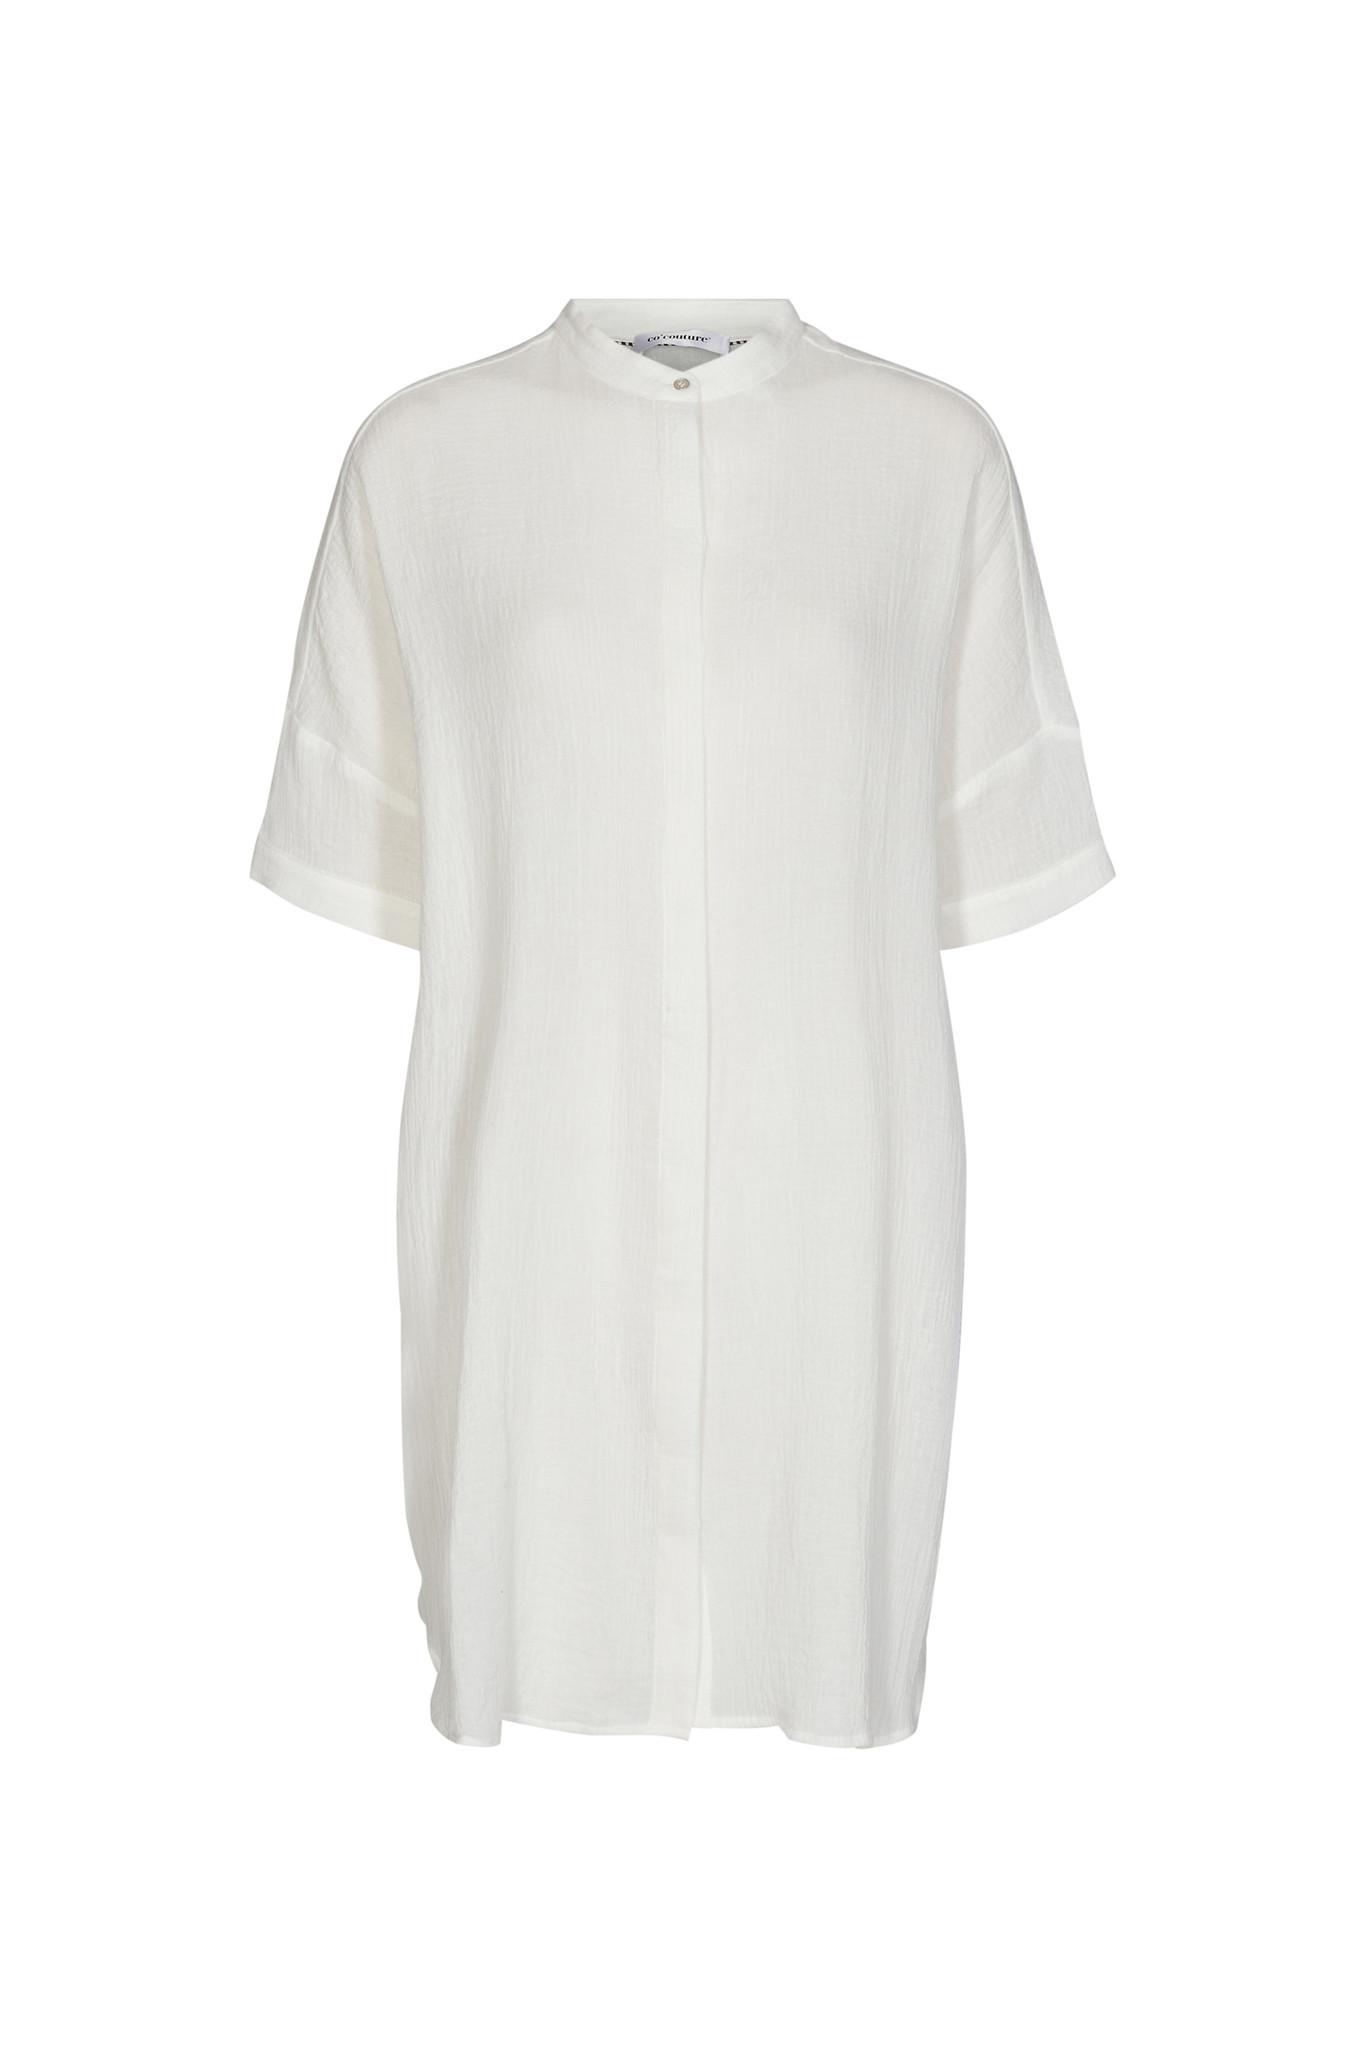 Crepe Tunic Shirt - Off White-1